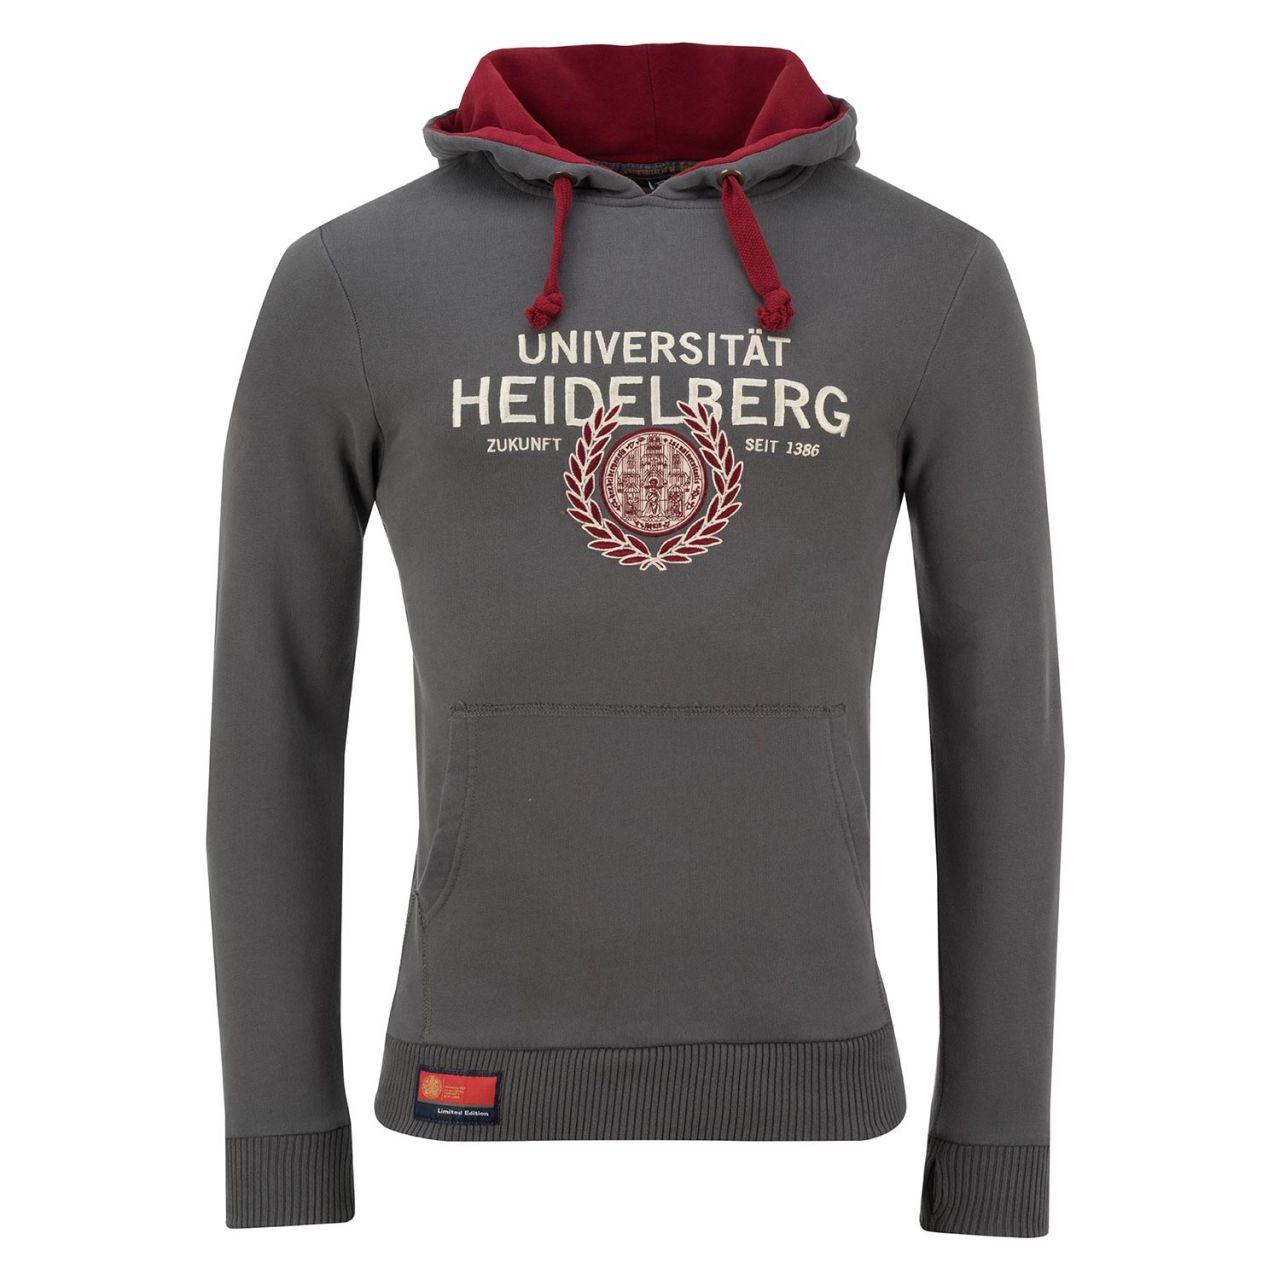 Limited Hooded Sweatshirt, grey, exclusive